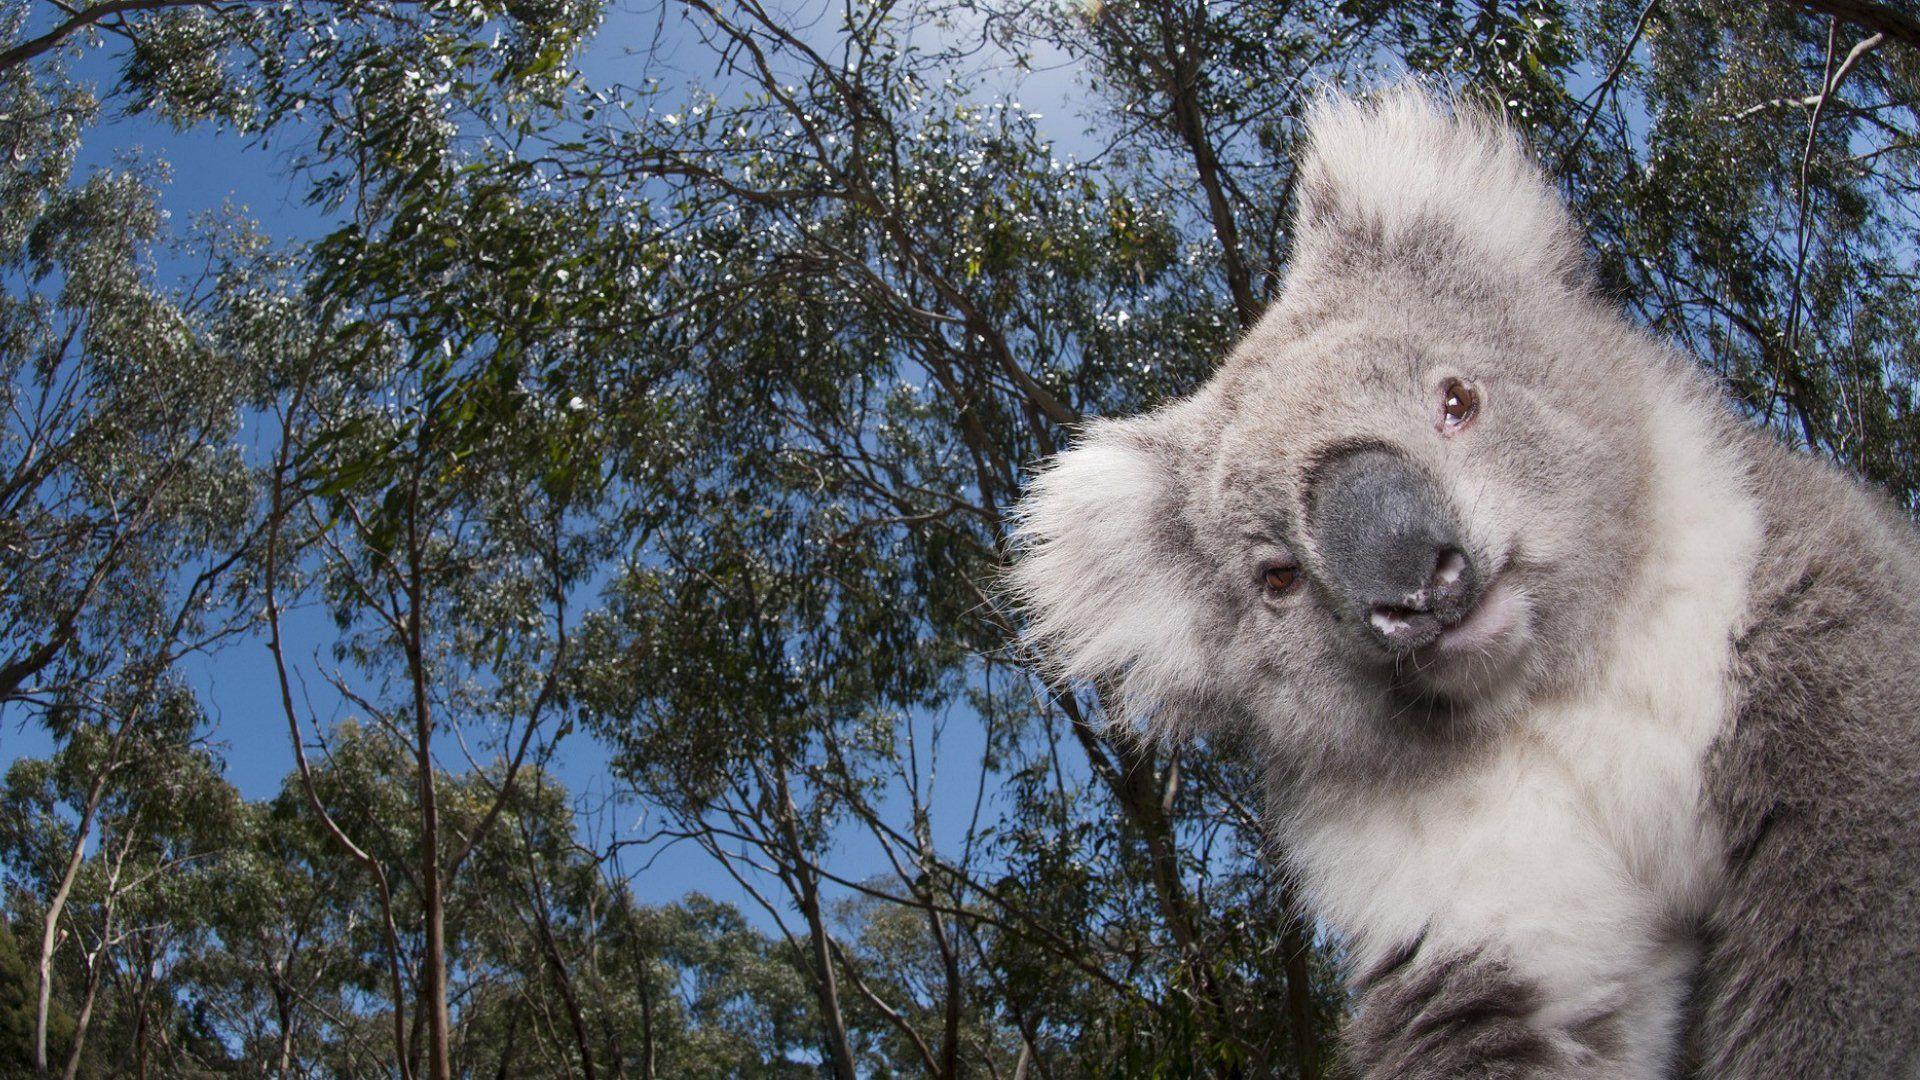 Koala Wallpaper 1920 X 1080 Via Classy Bro Cool Wallpapers